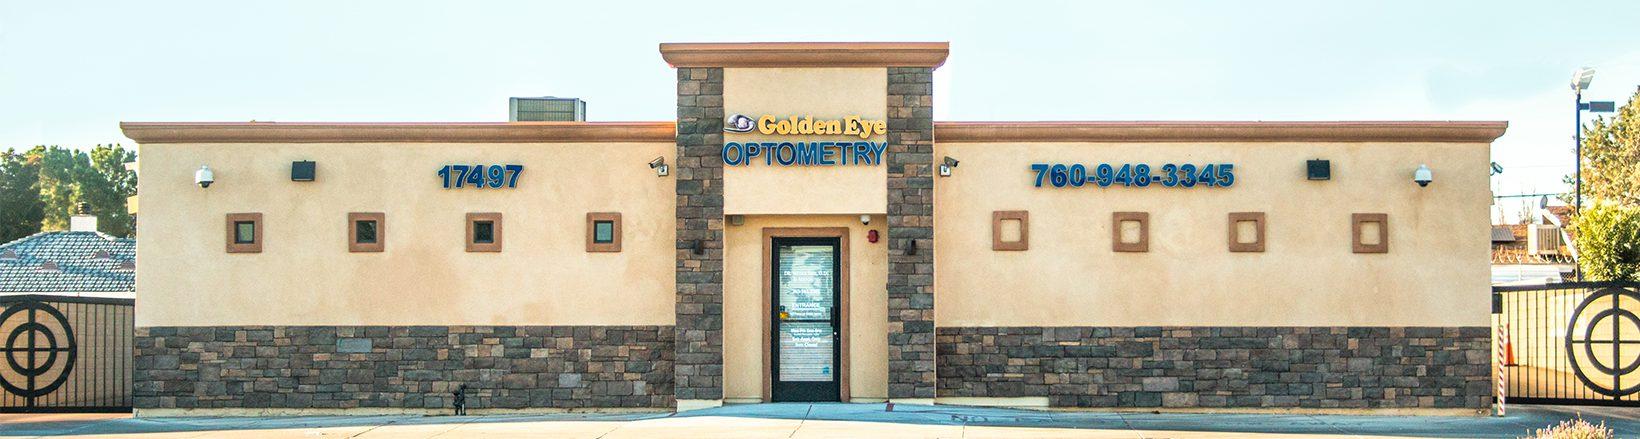 Golden Eye Optometry Building